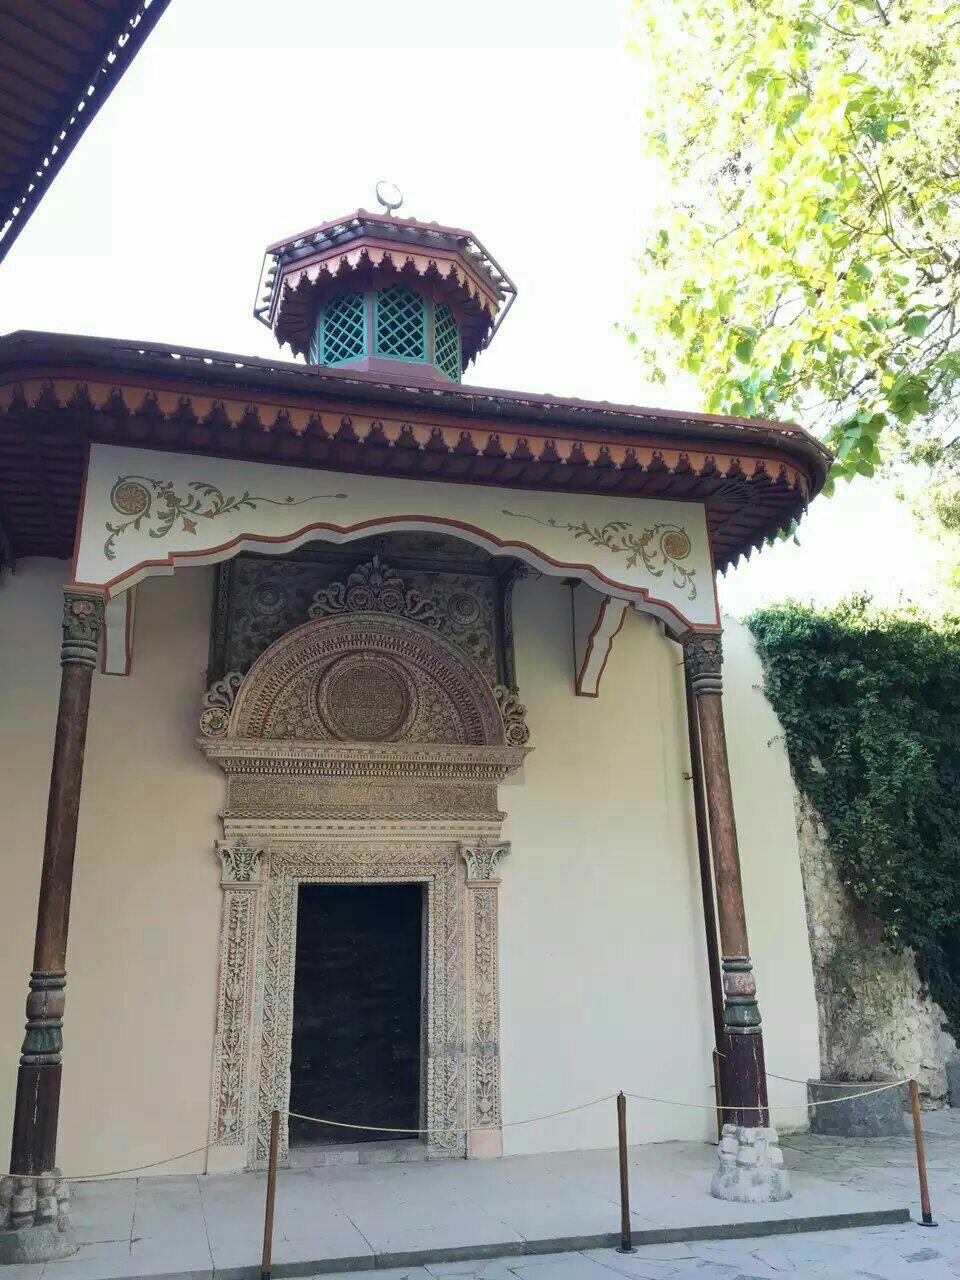 巴赫奇萨赖汗宫  Bakhchisaray Palace   -0